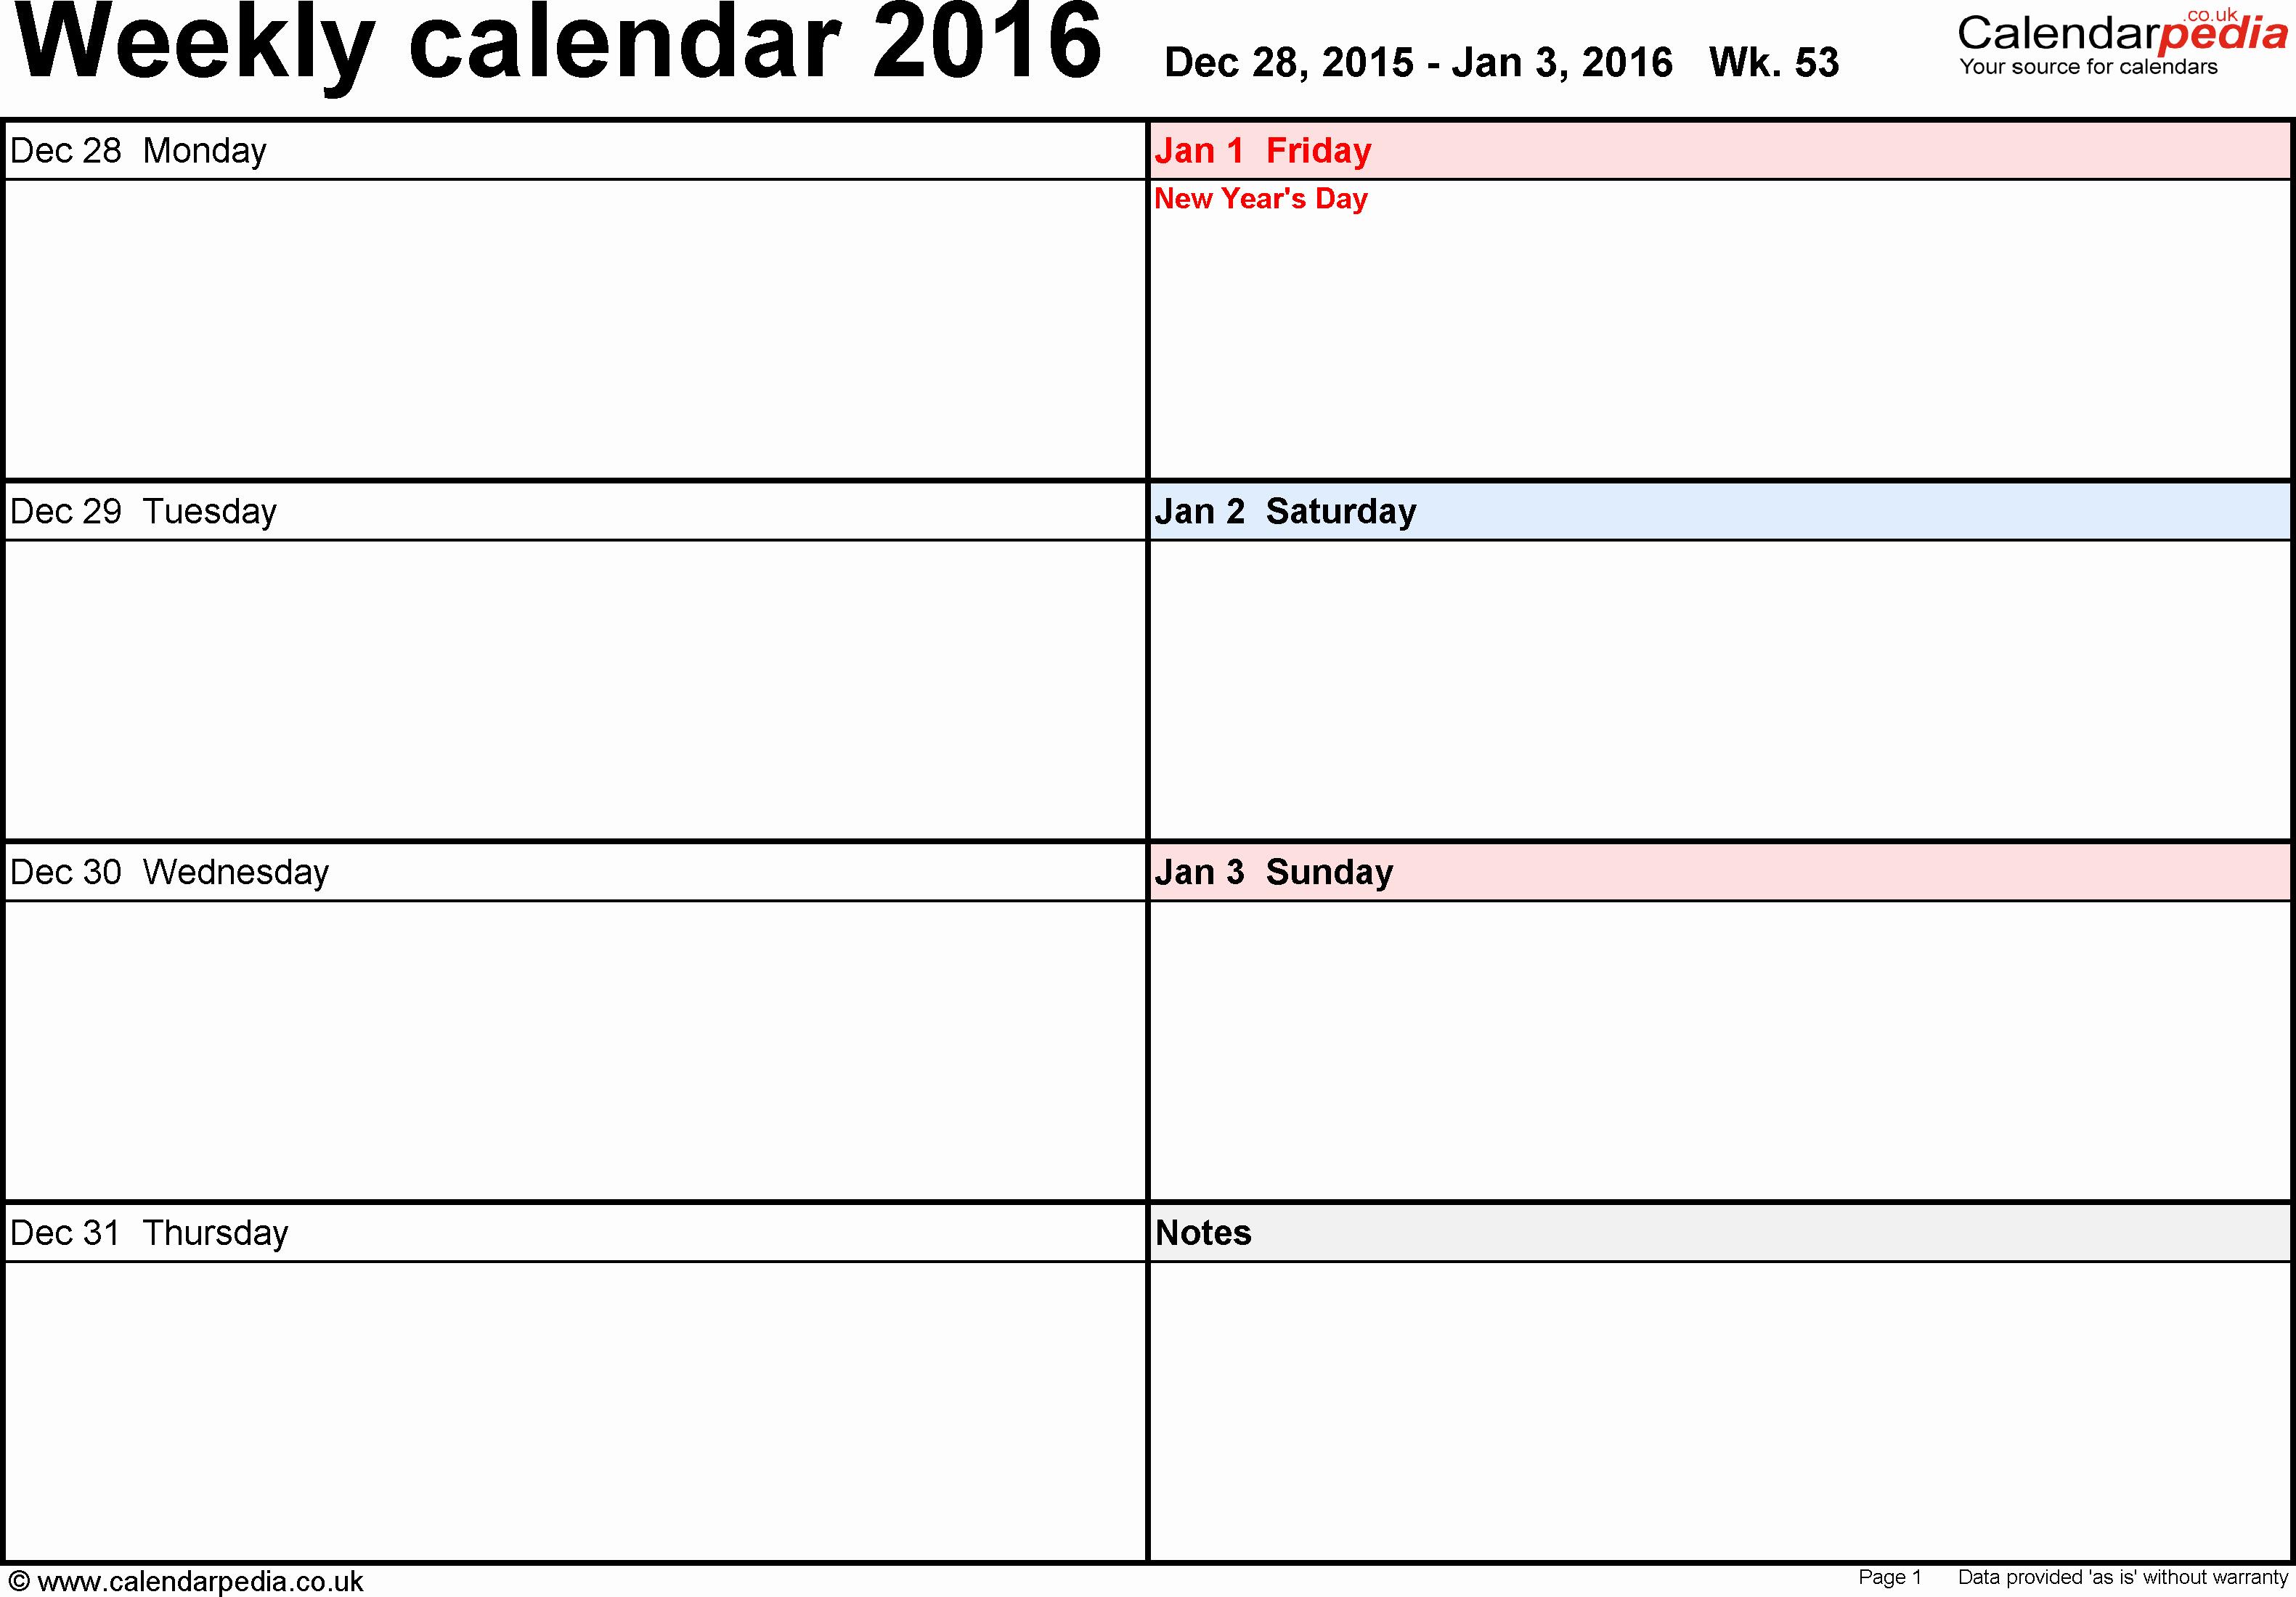 Free Printable Calendar 2016 Template Fresh Weekly Calendar 2016